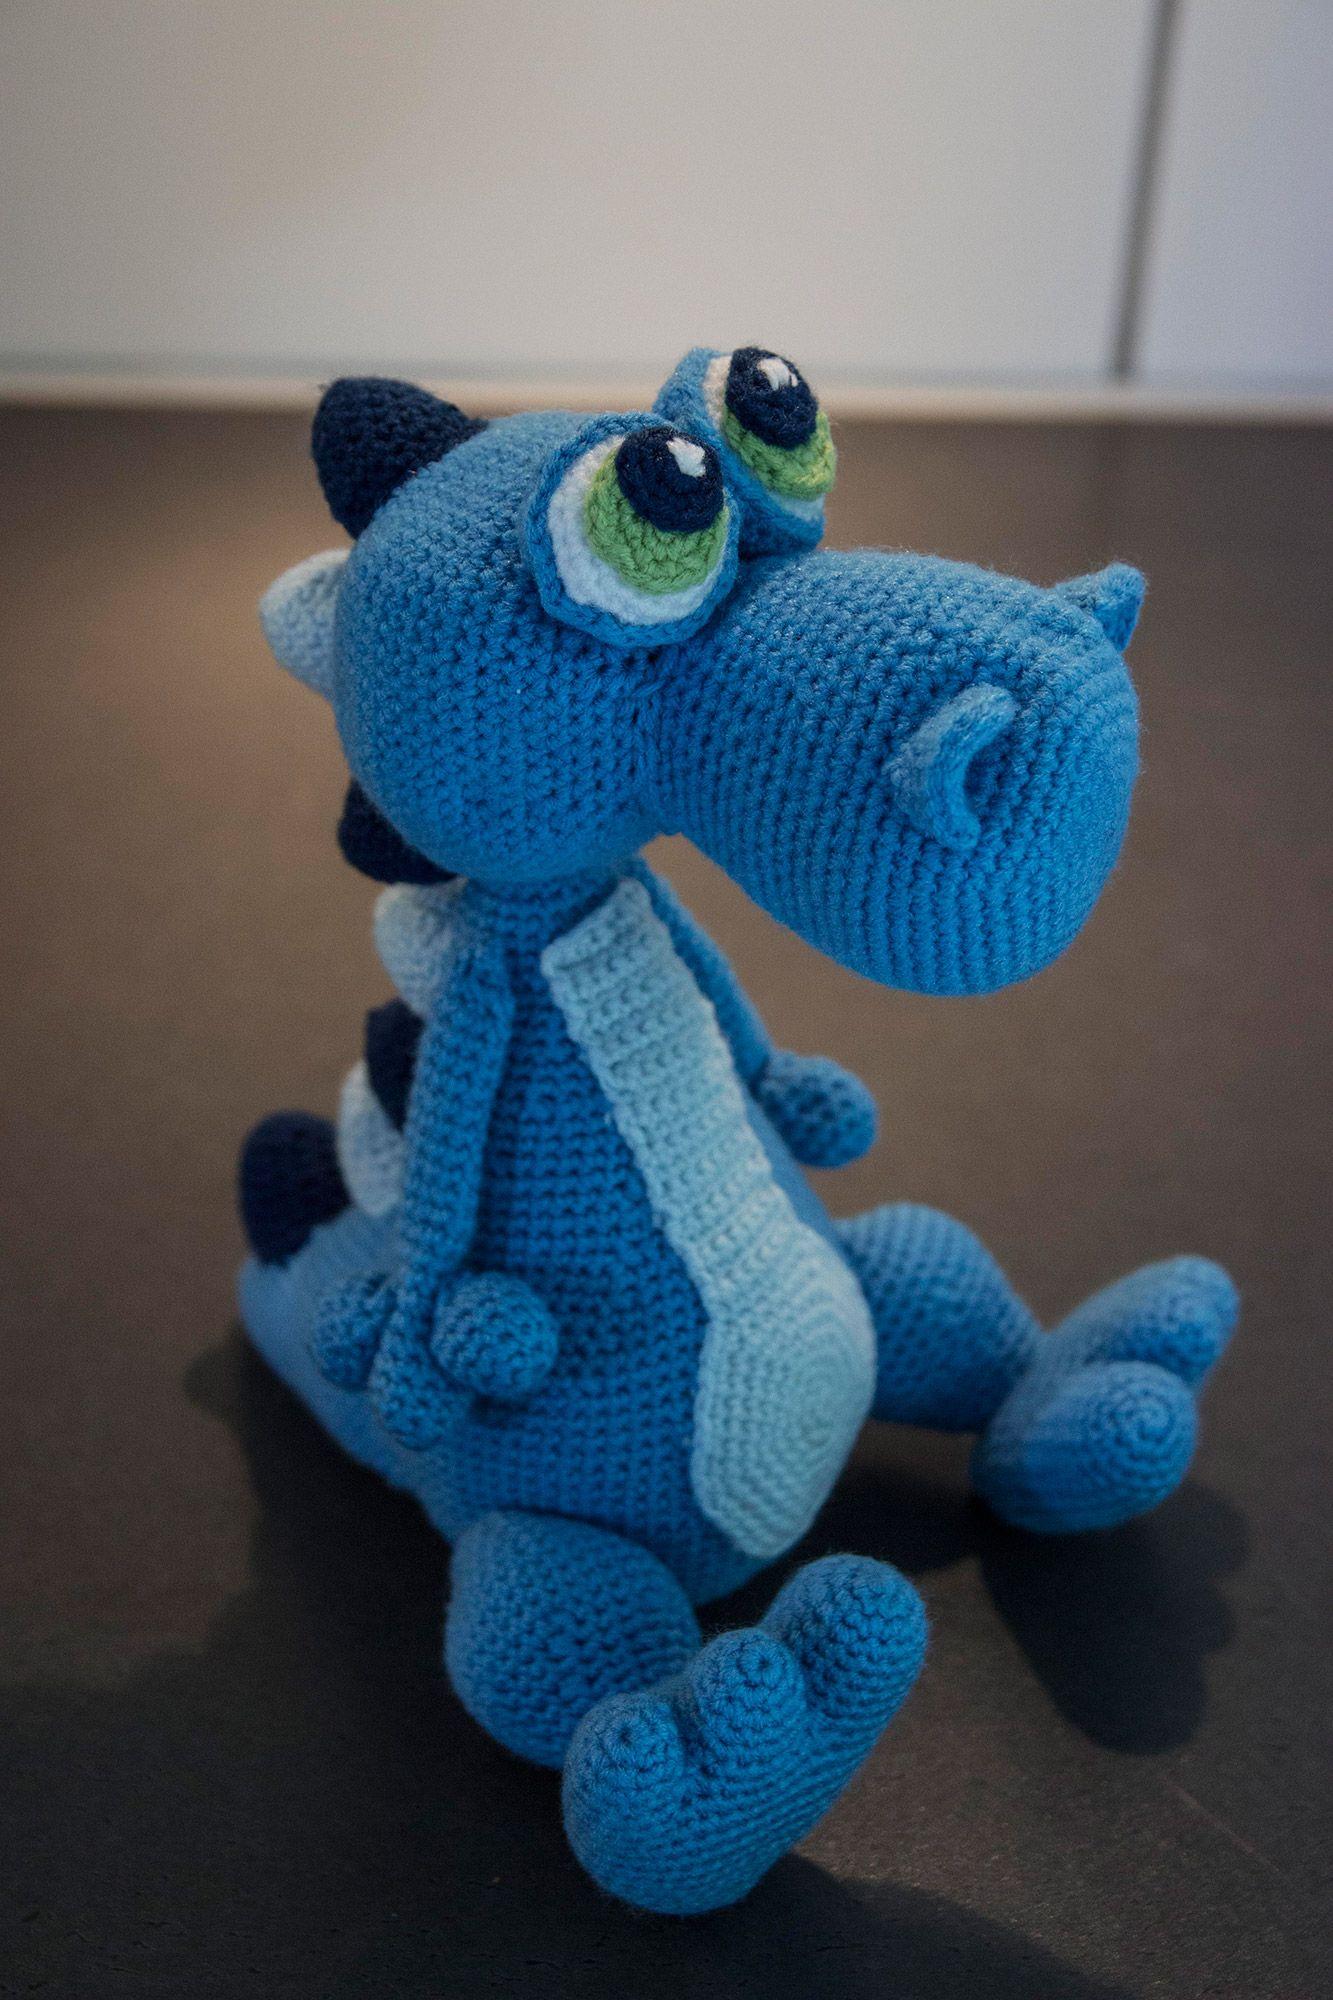 Kreativius H 230 Klet Dino Crochet H 230 Kle H 230 Kling Dyr